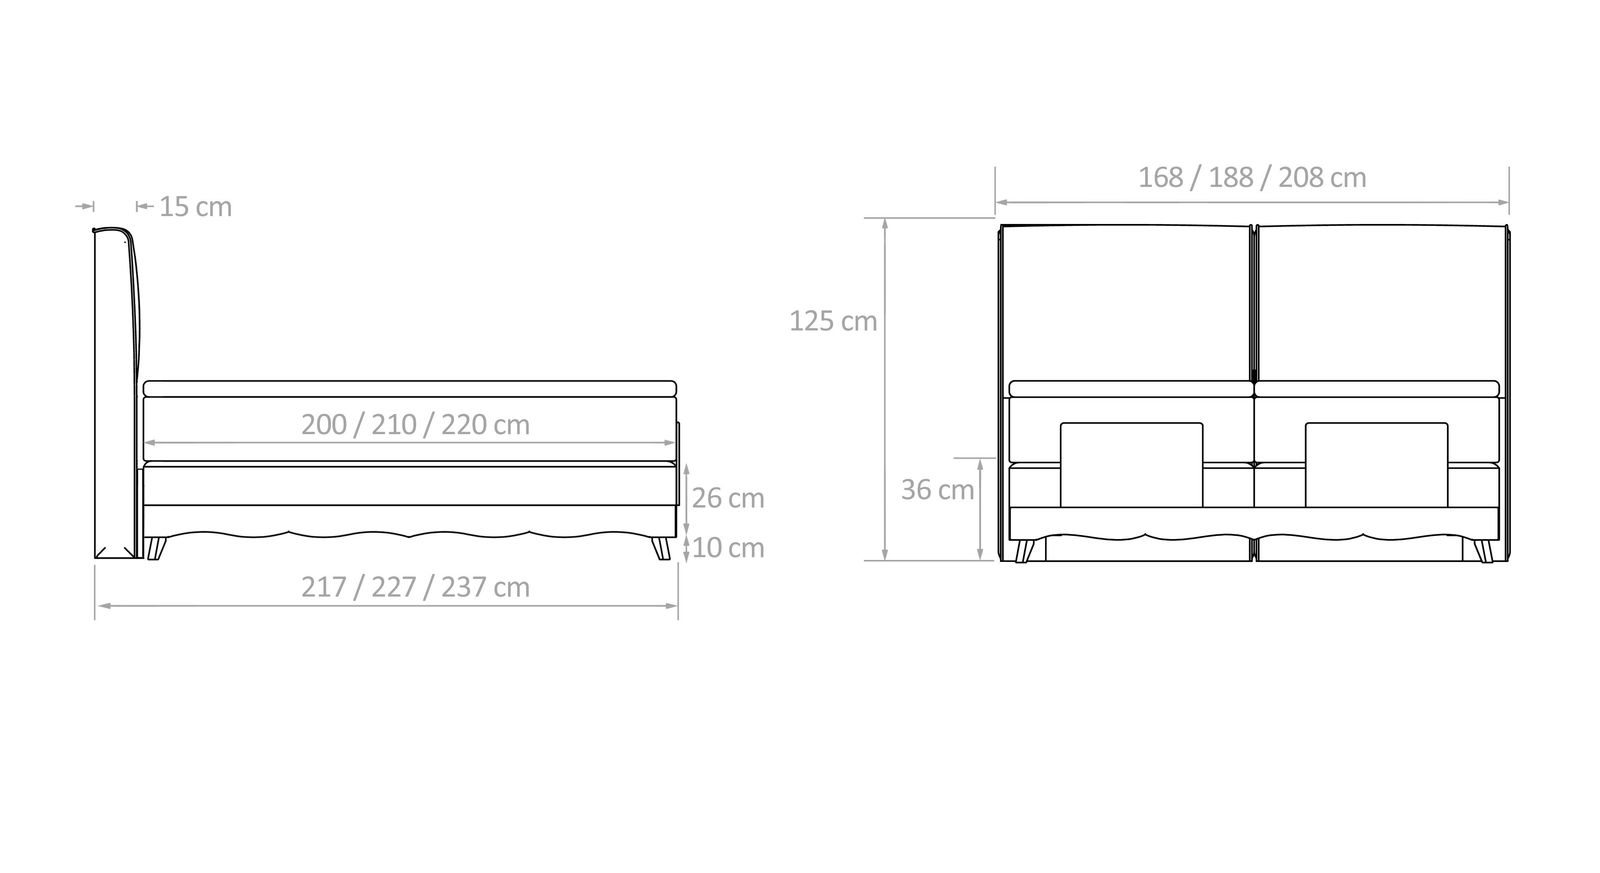 Grafik über die Maße des Boxspringbettes Bakar